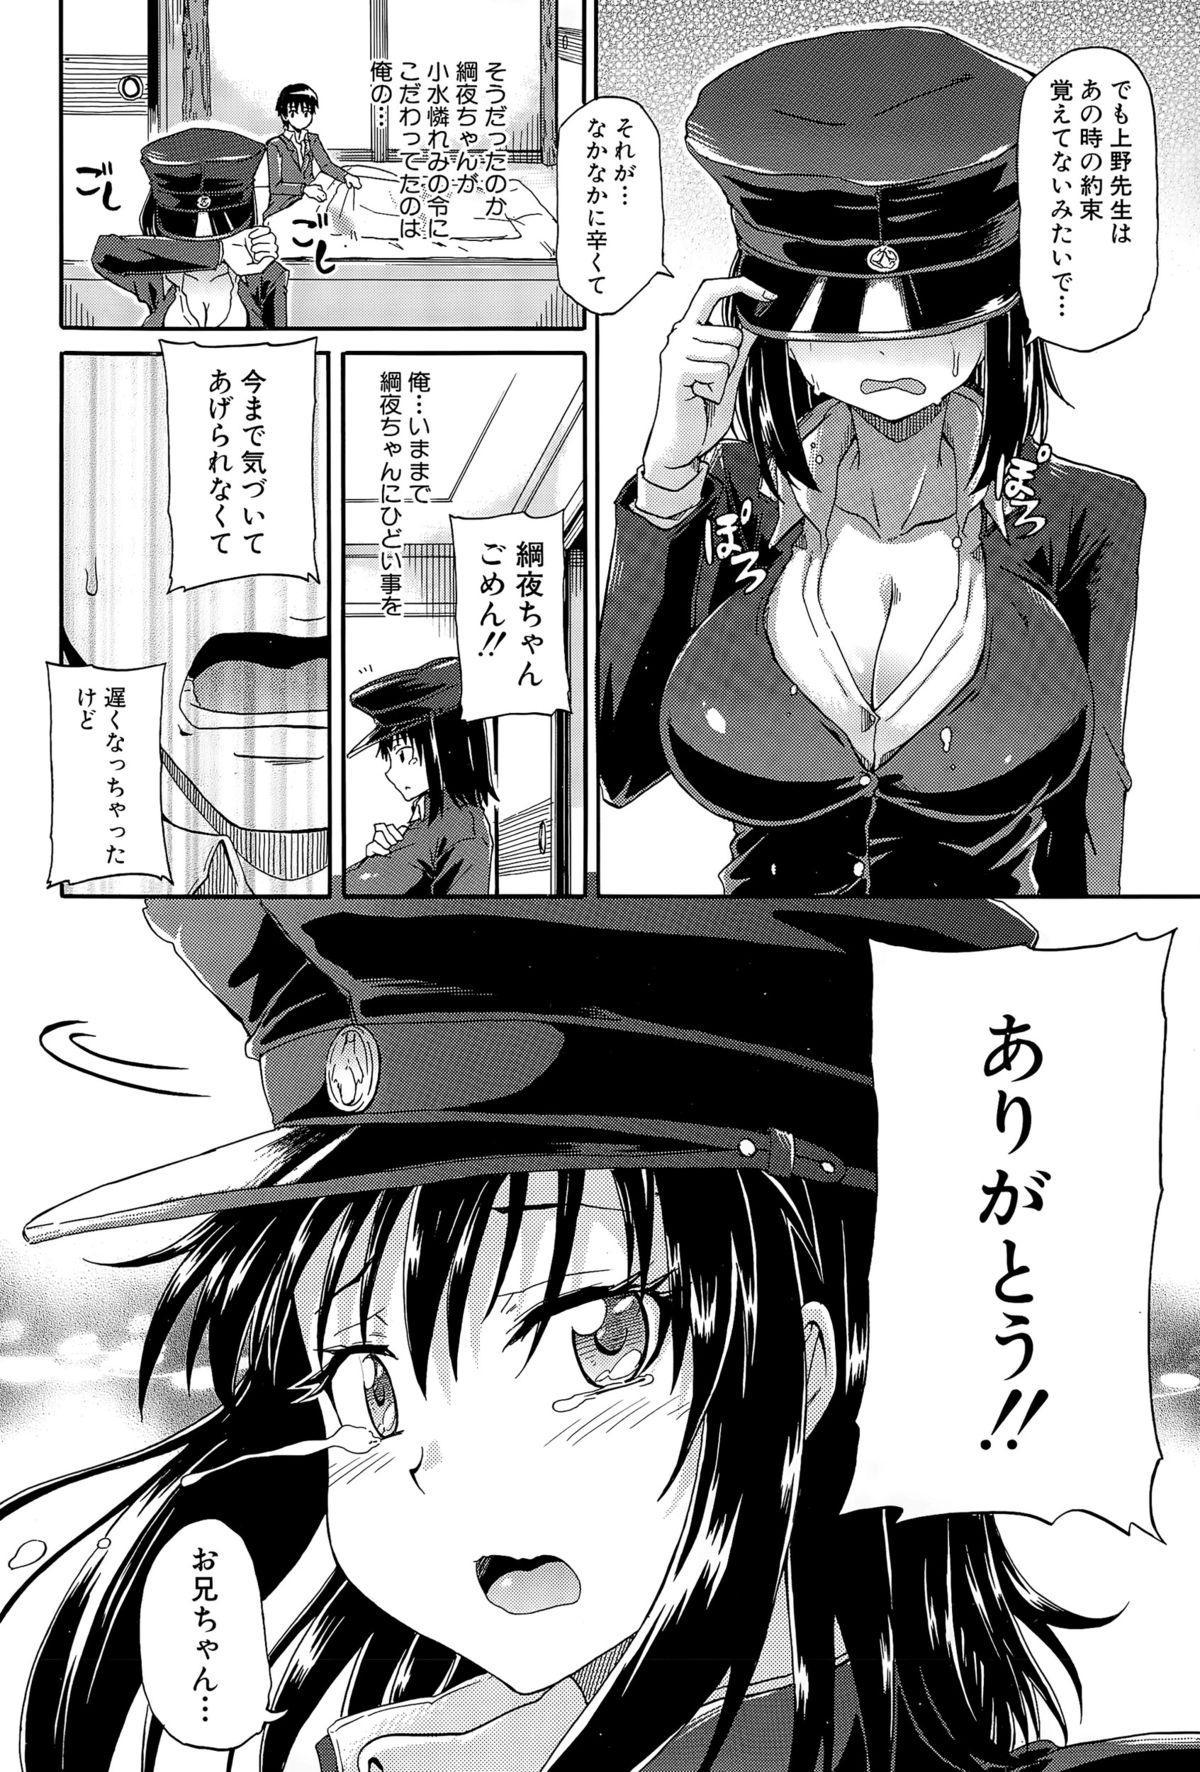 Shousui Awaremi!! Ch. 1-4 119